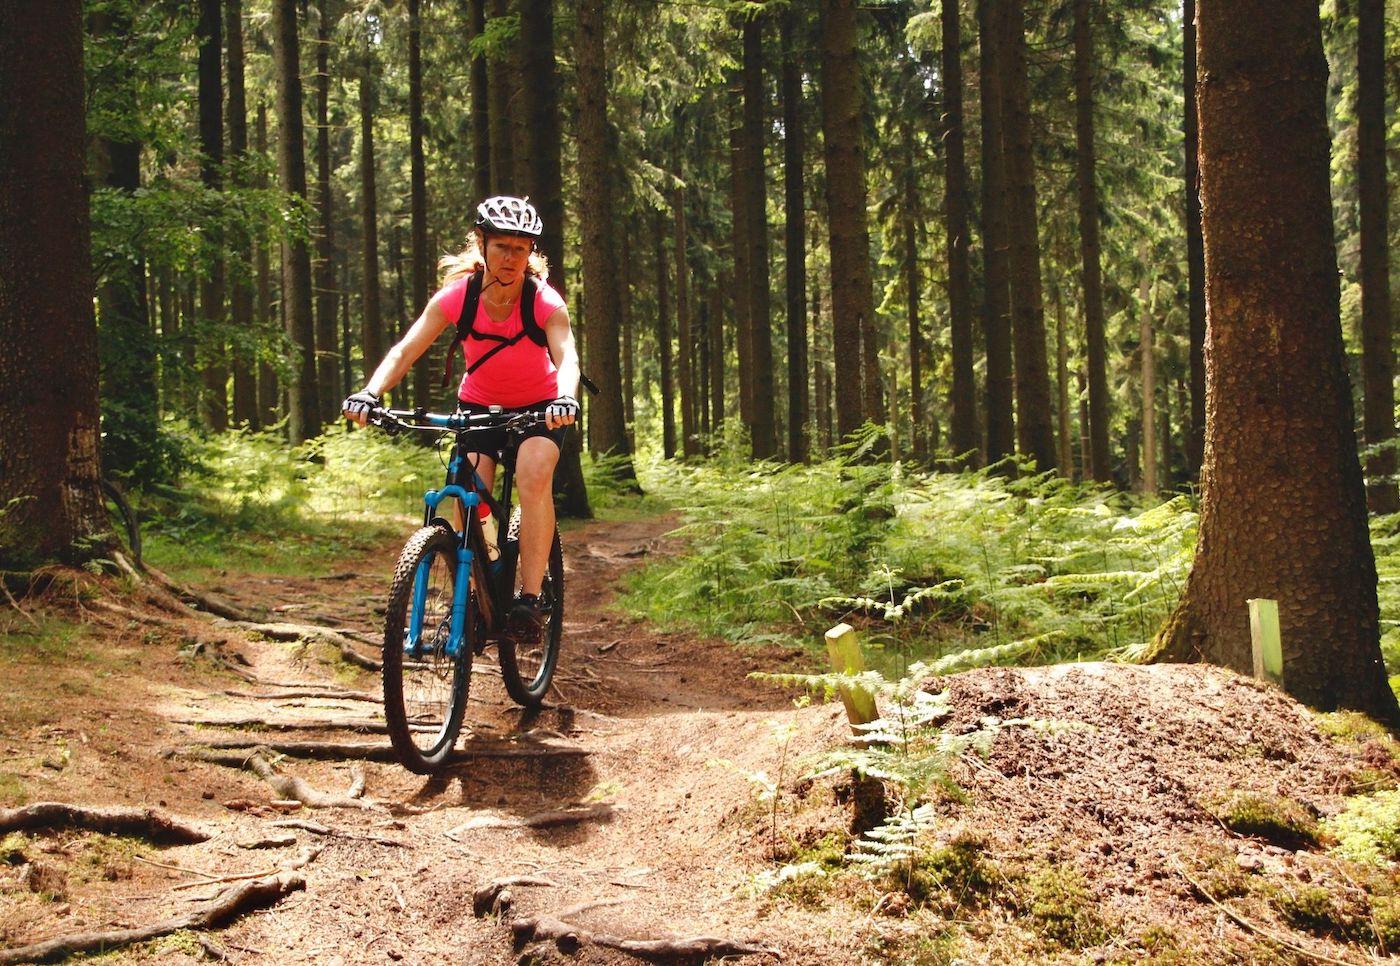 MTB eBike Kurse in Darmstadt - Frankenstein Fahrtechnik Training Rock my Trail Bikeschule -1